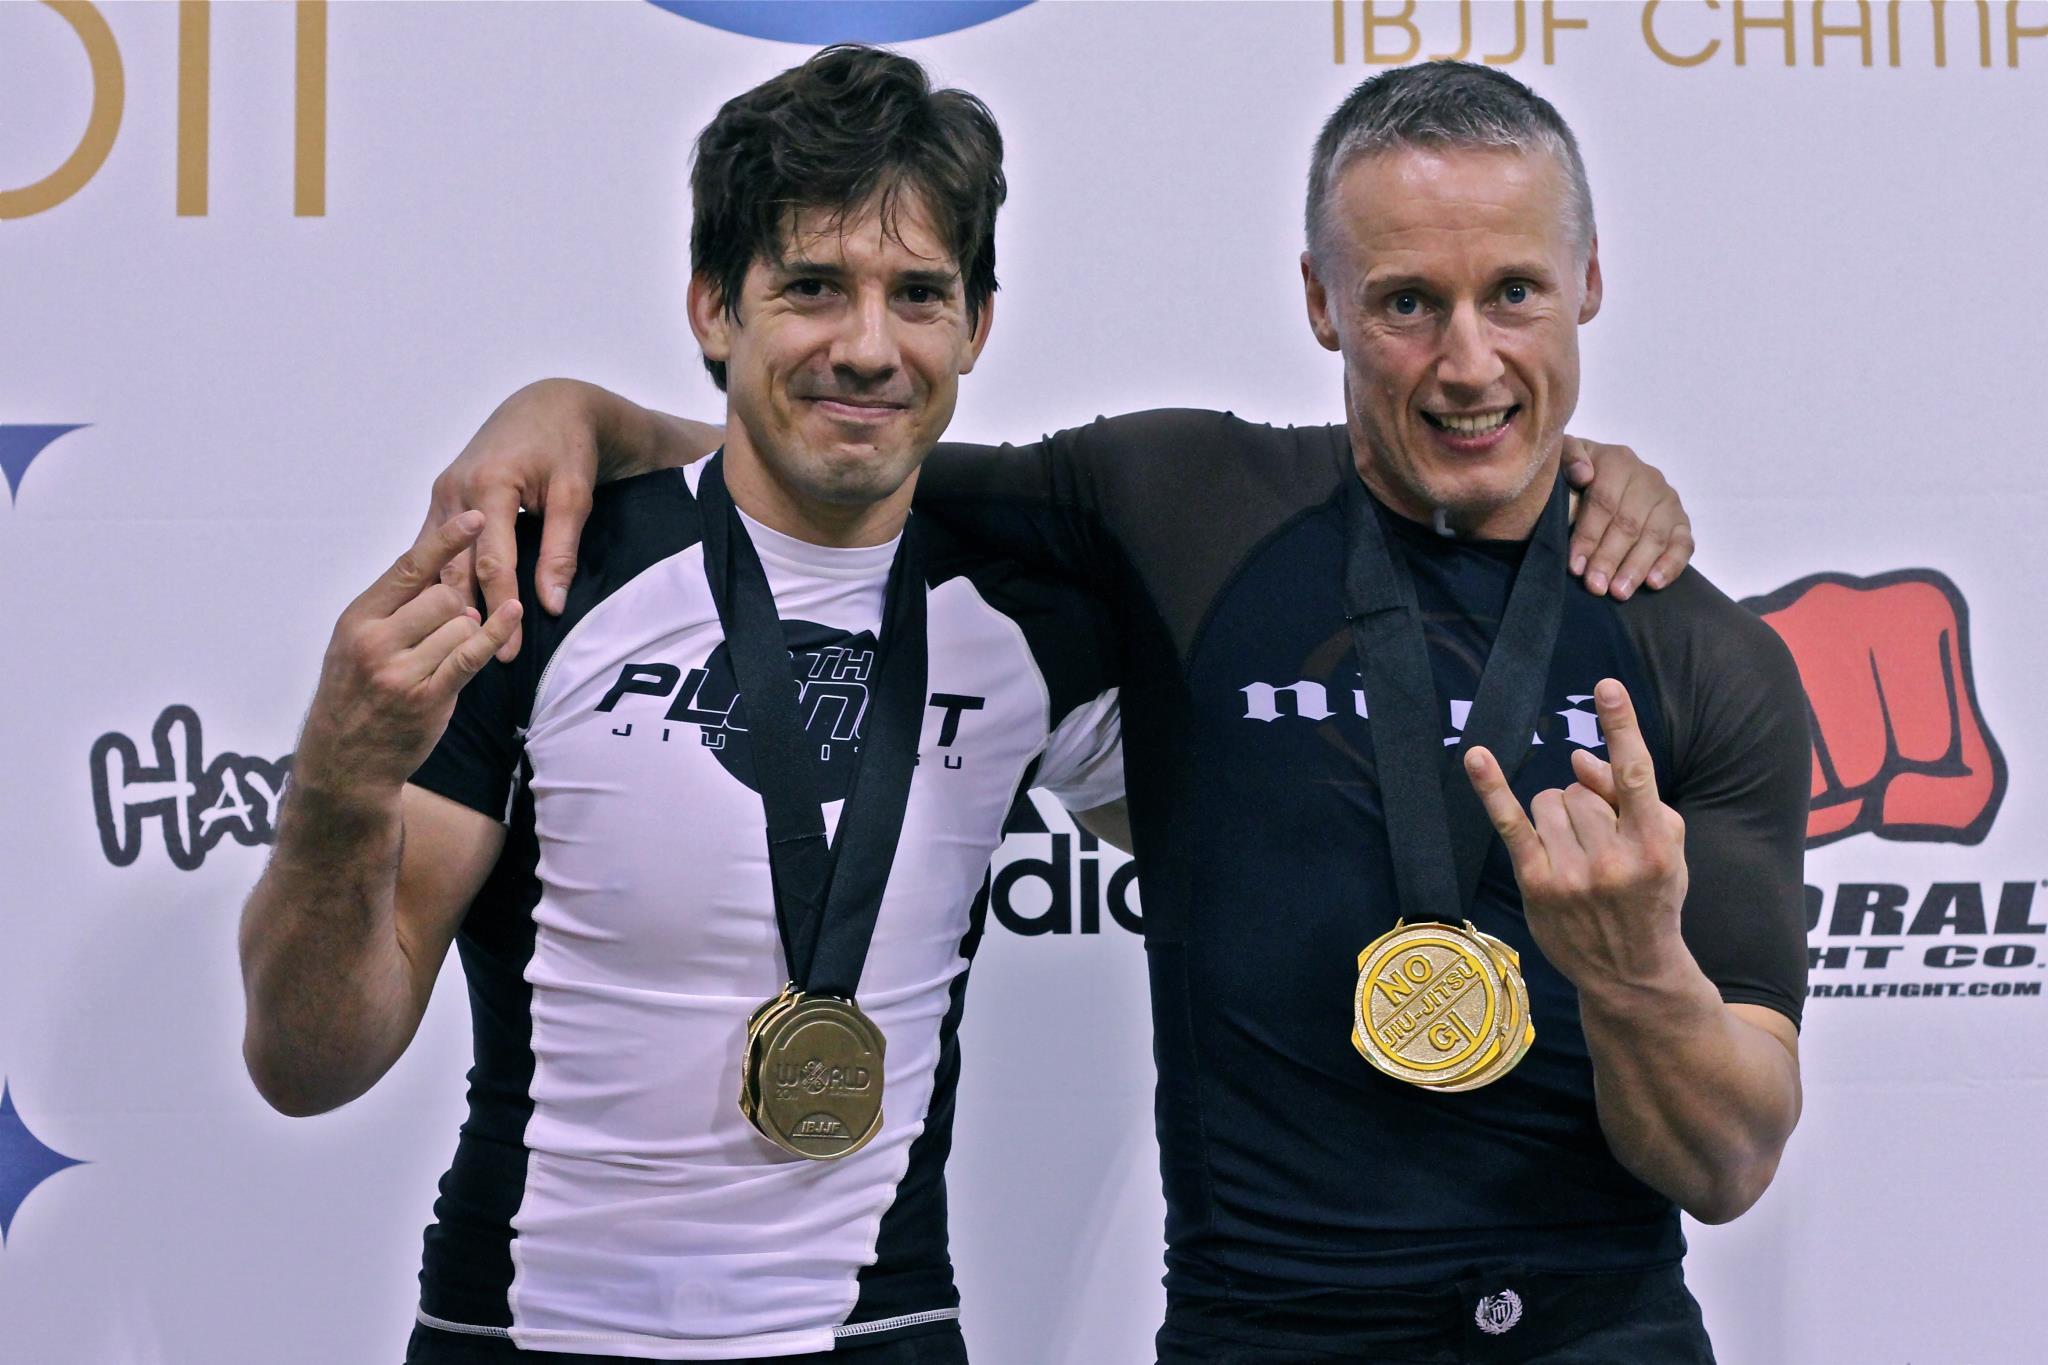 2011-nogi-world-champ.jpg